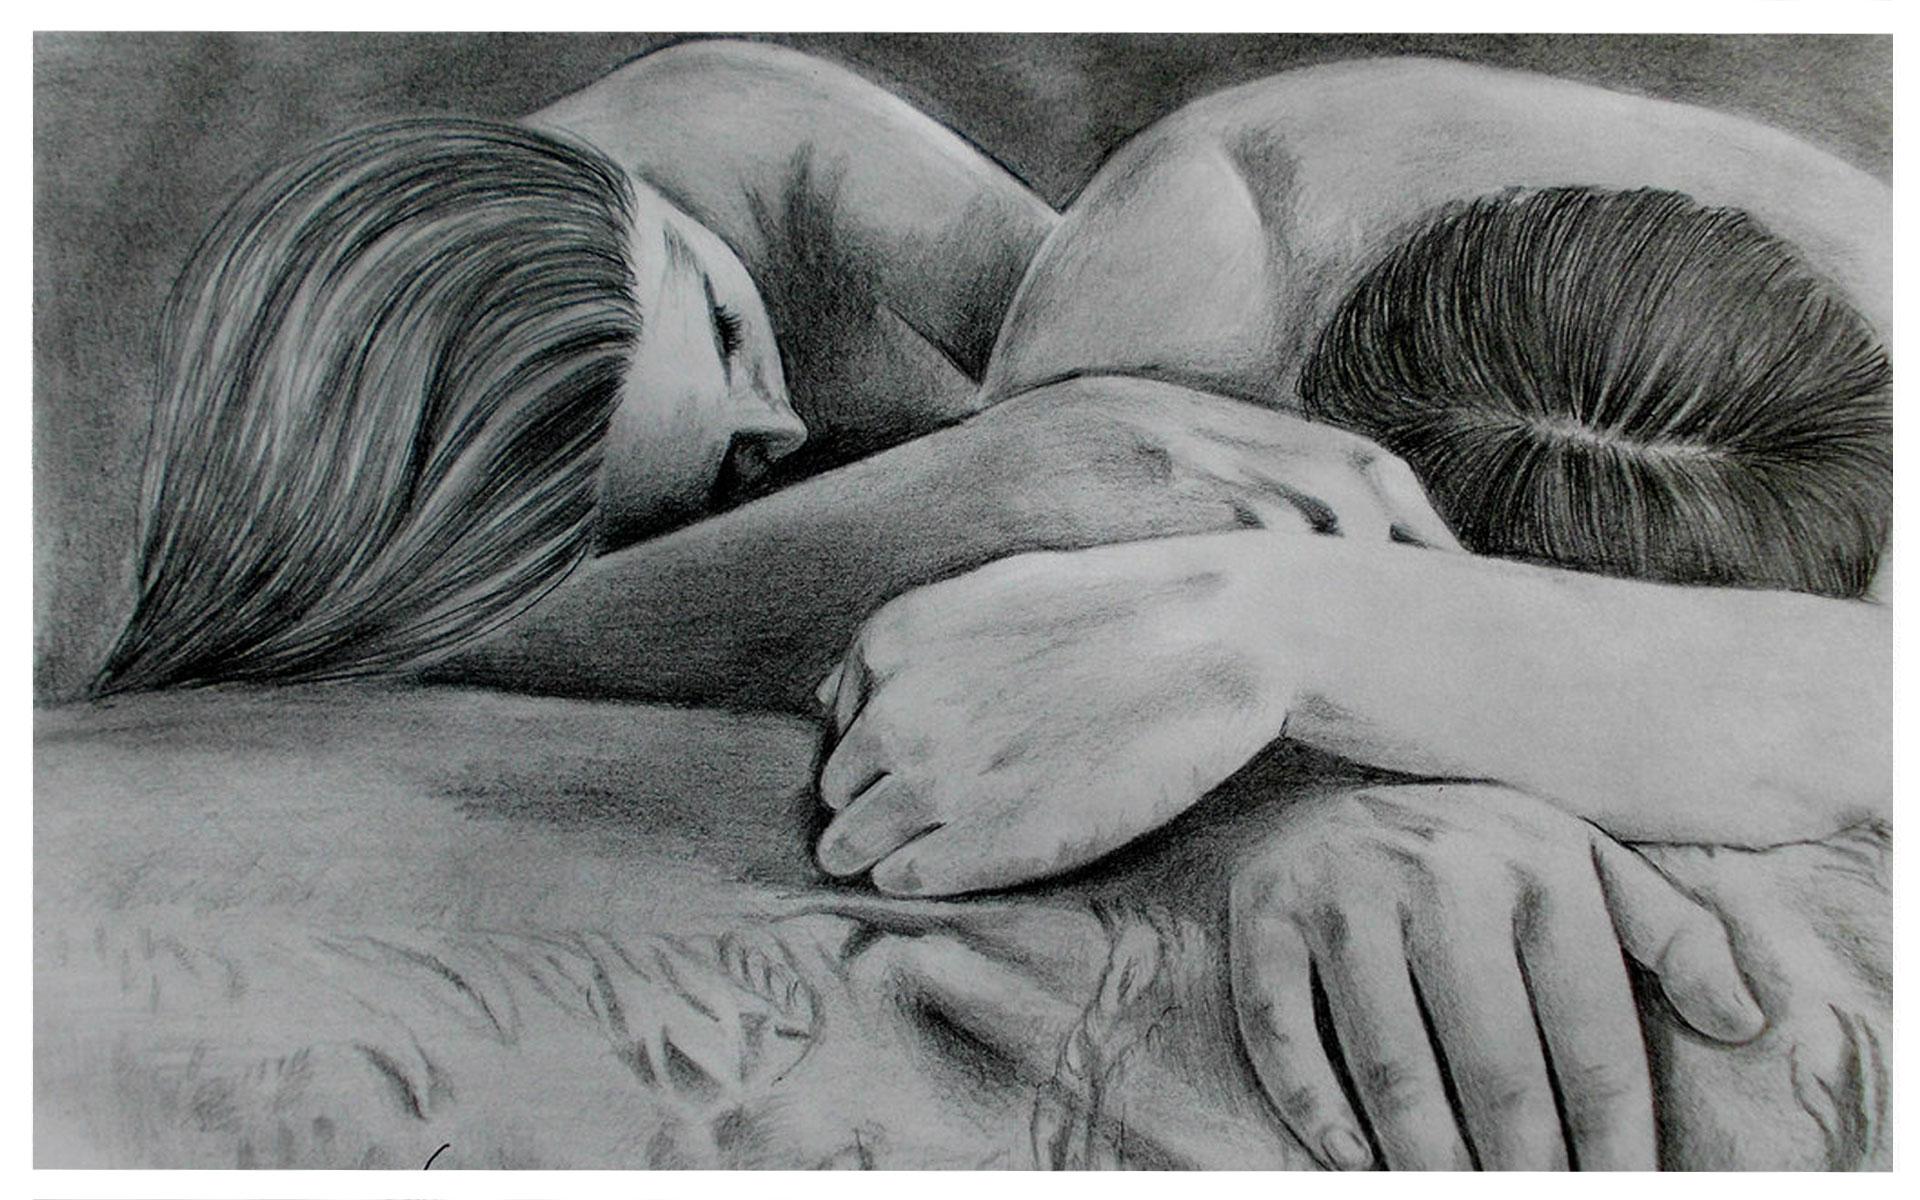 Love Sketch Wallpaper Love Sketches Of Girl 1920x1200 Download Hd Wallpaper Wallpapertip